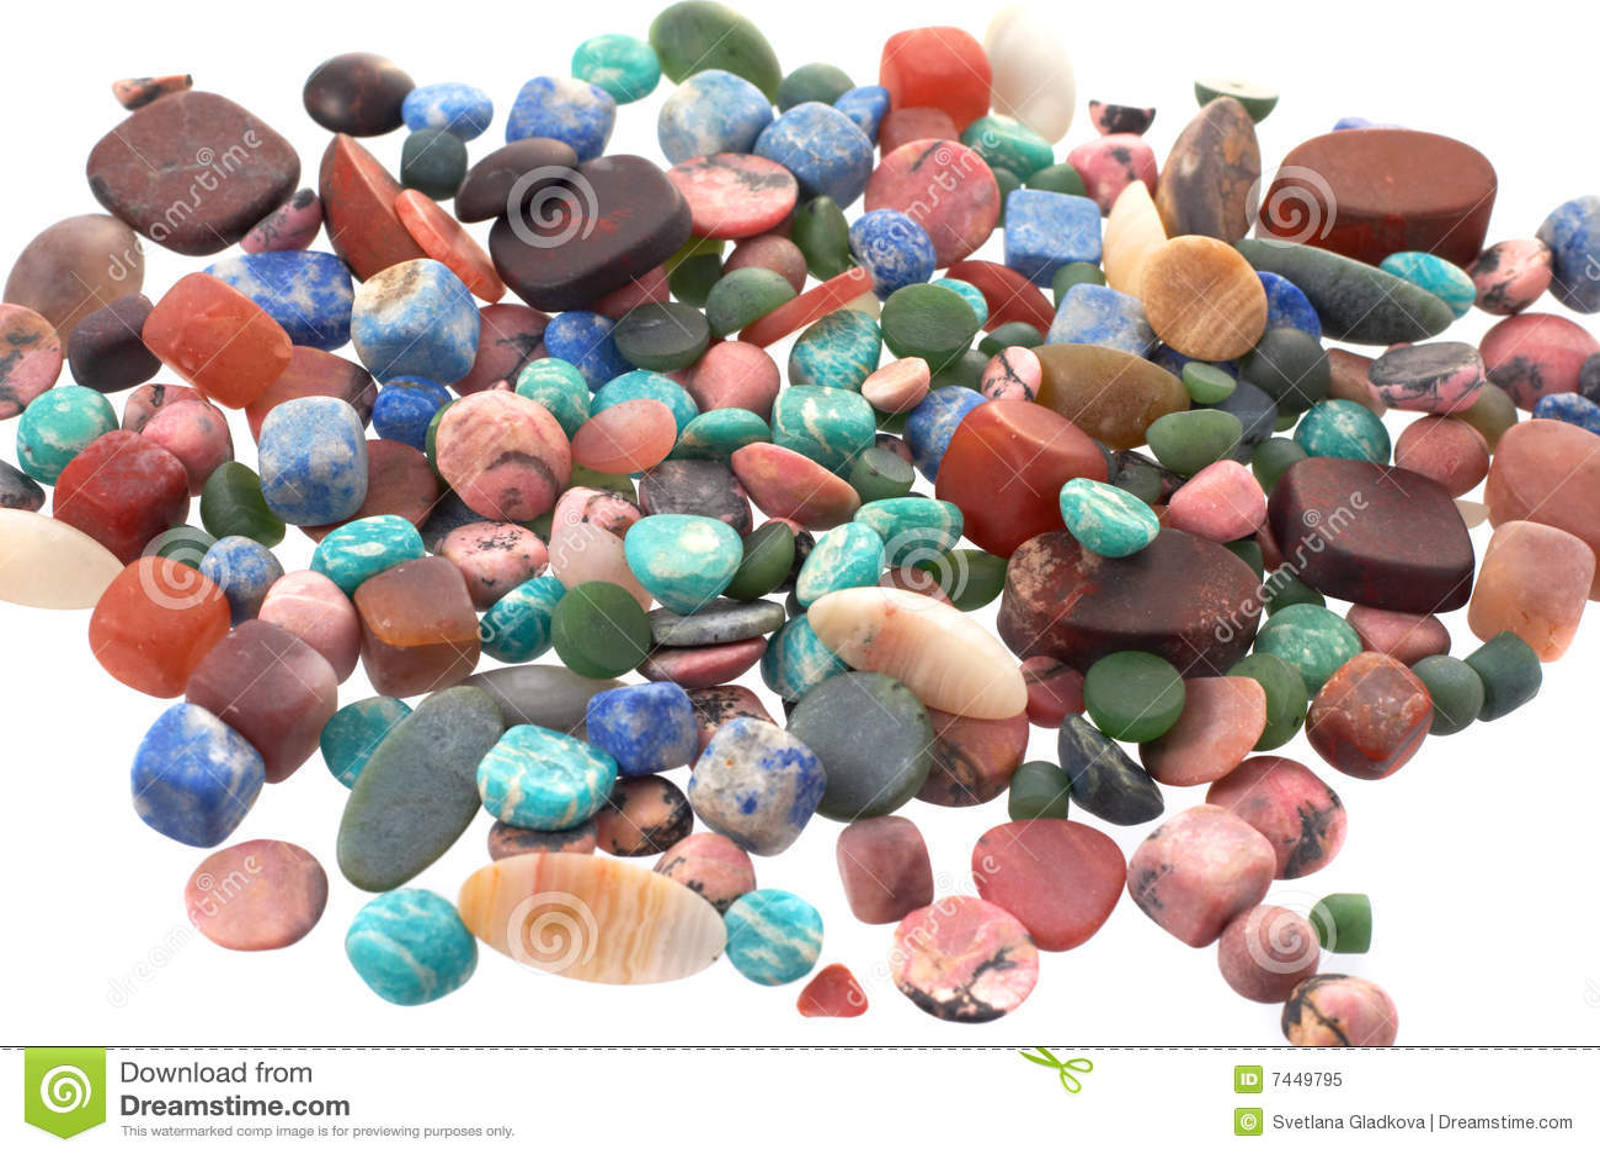 As pedras semipreciosas